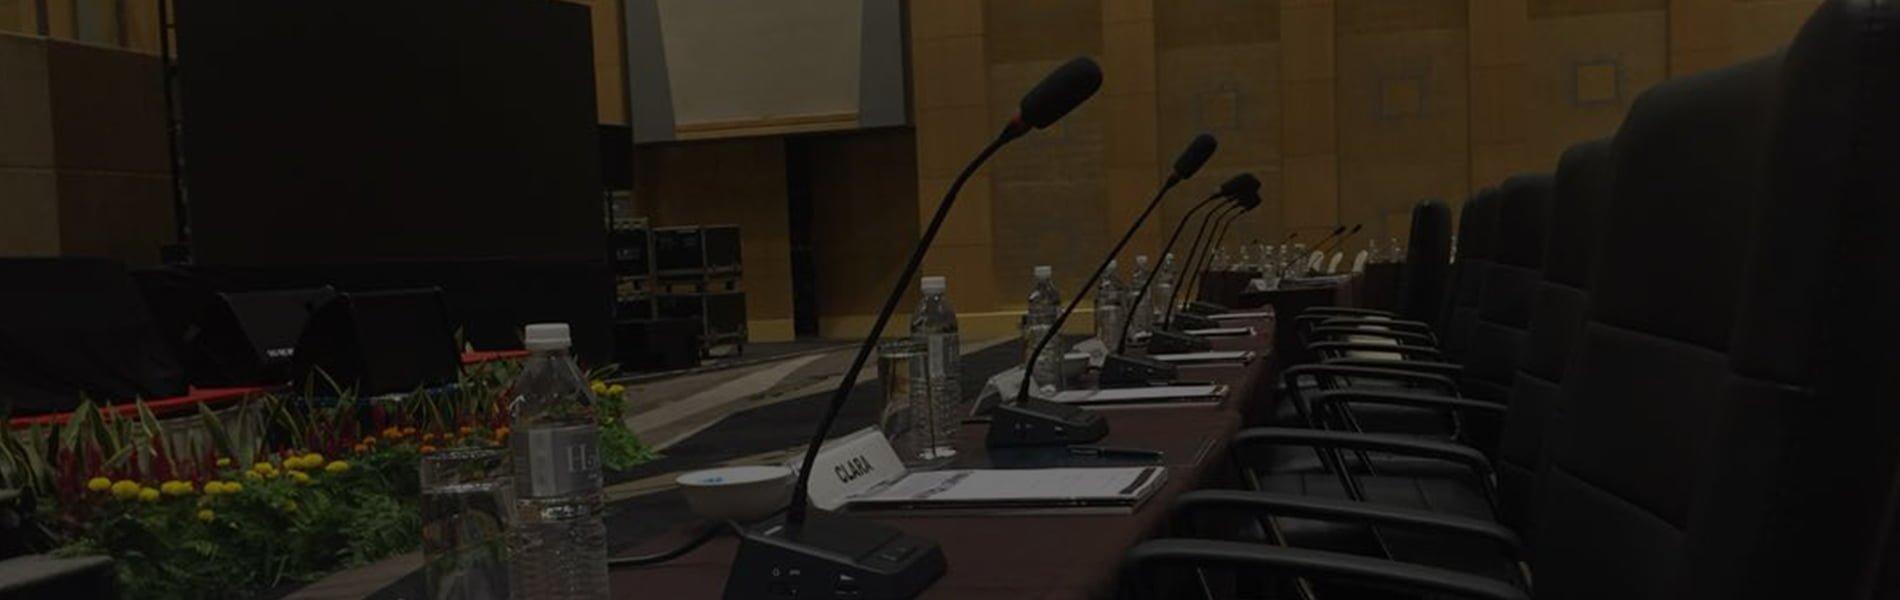 banner conference system